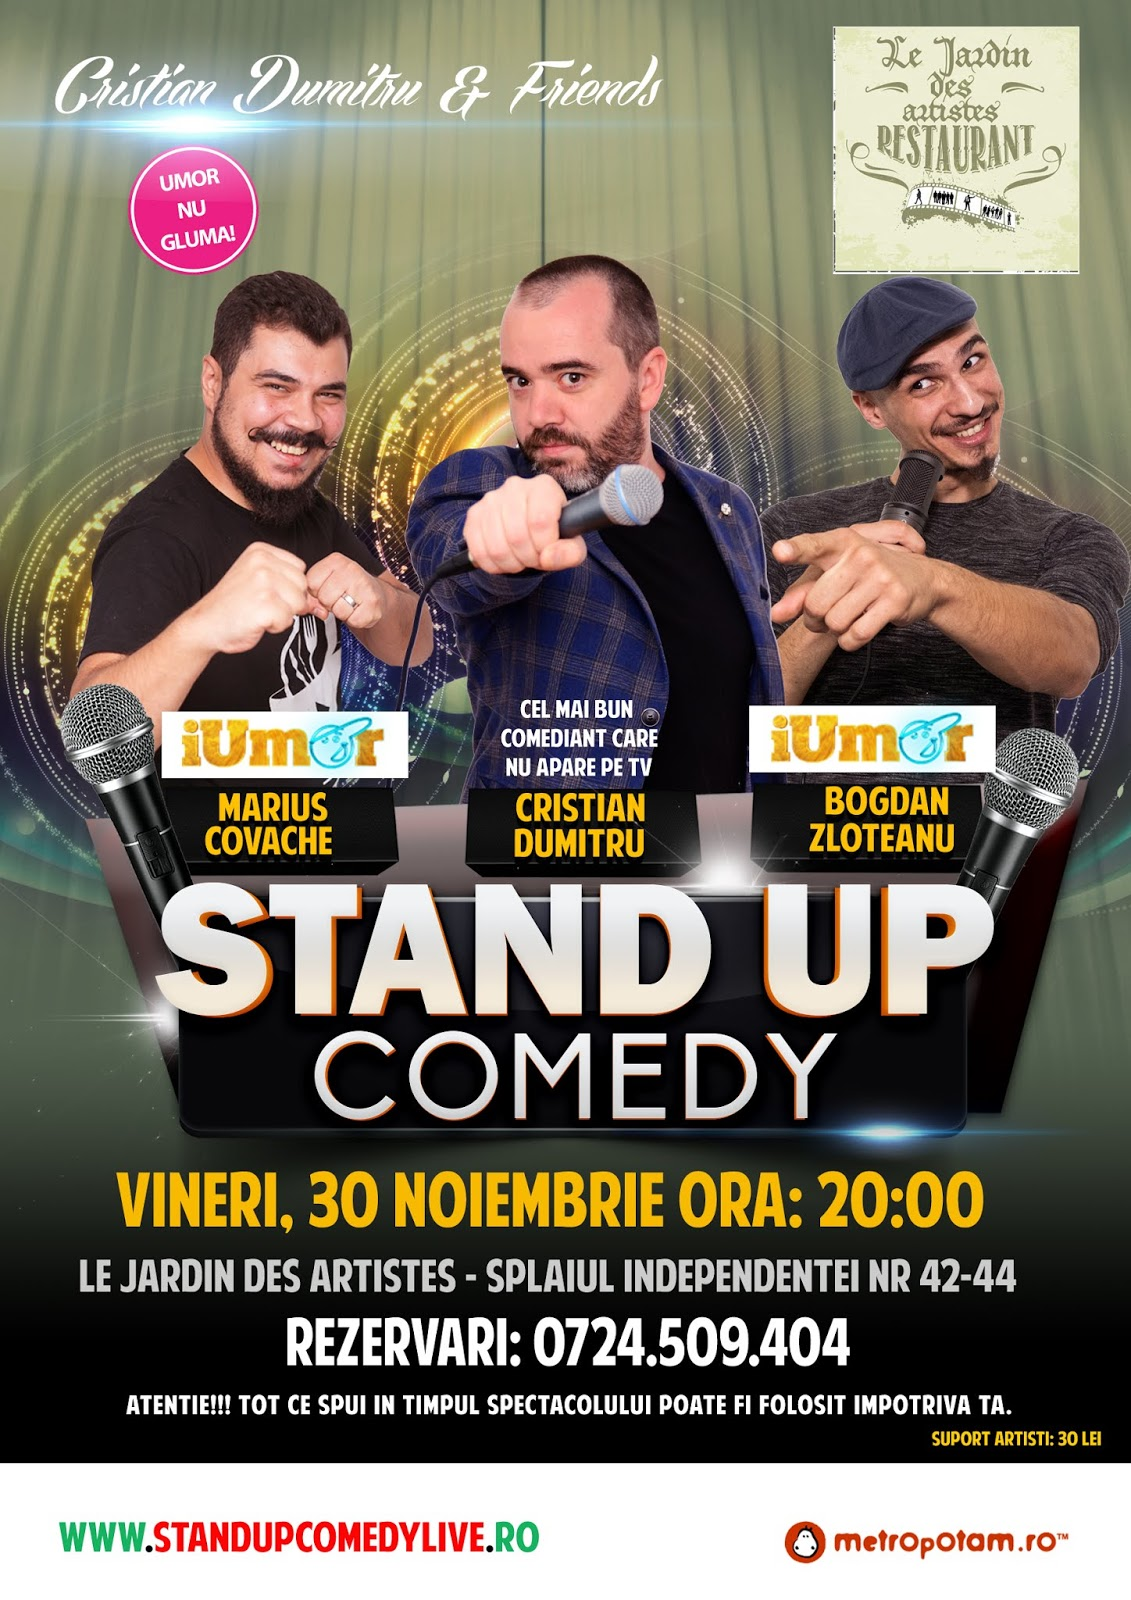 Stand-Up Comedy Vineri, 30 Noiembrie Bucuresti